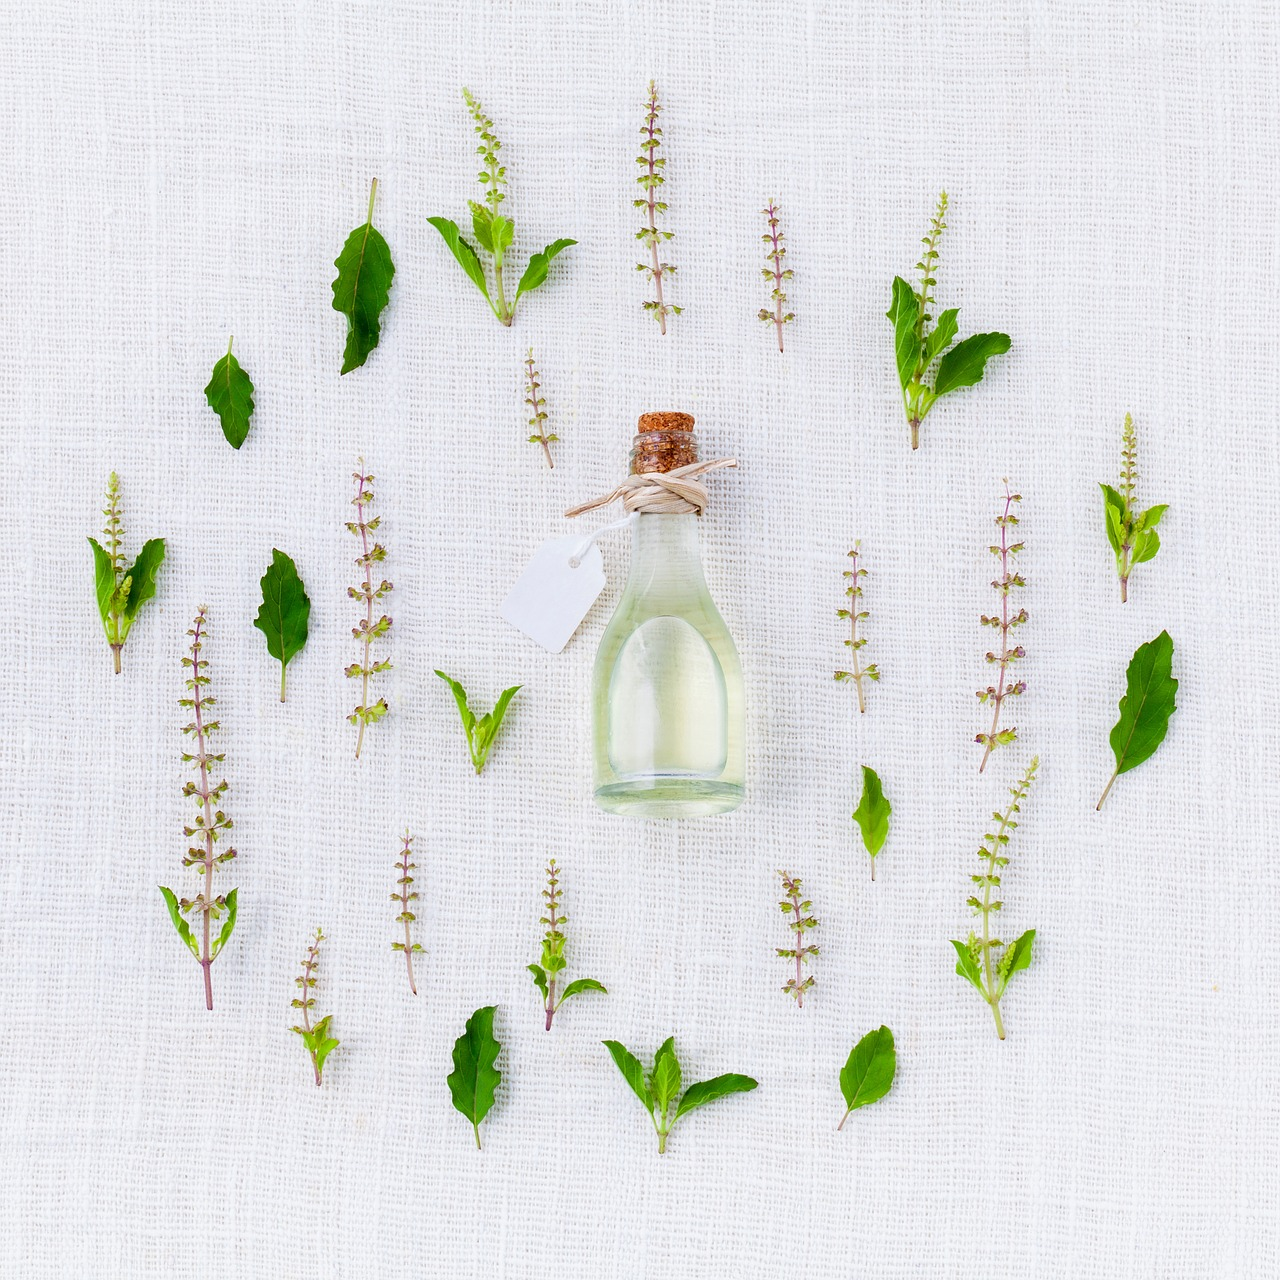 Properties of Thyme Oil